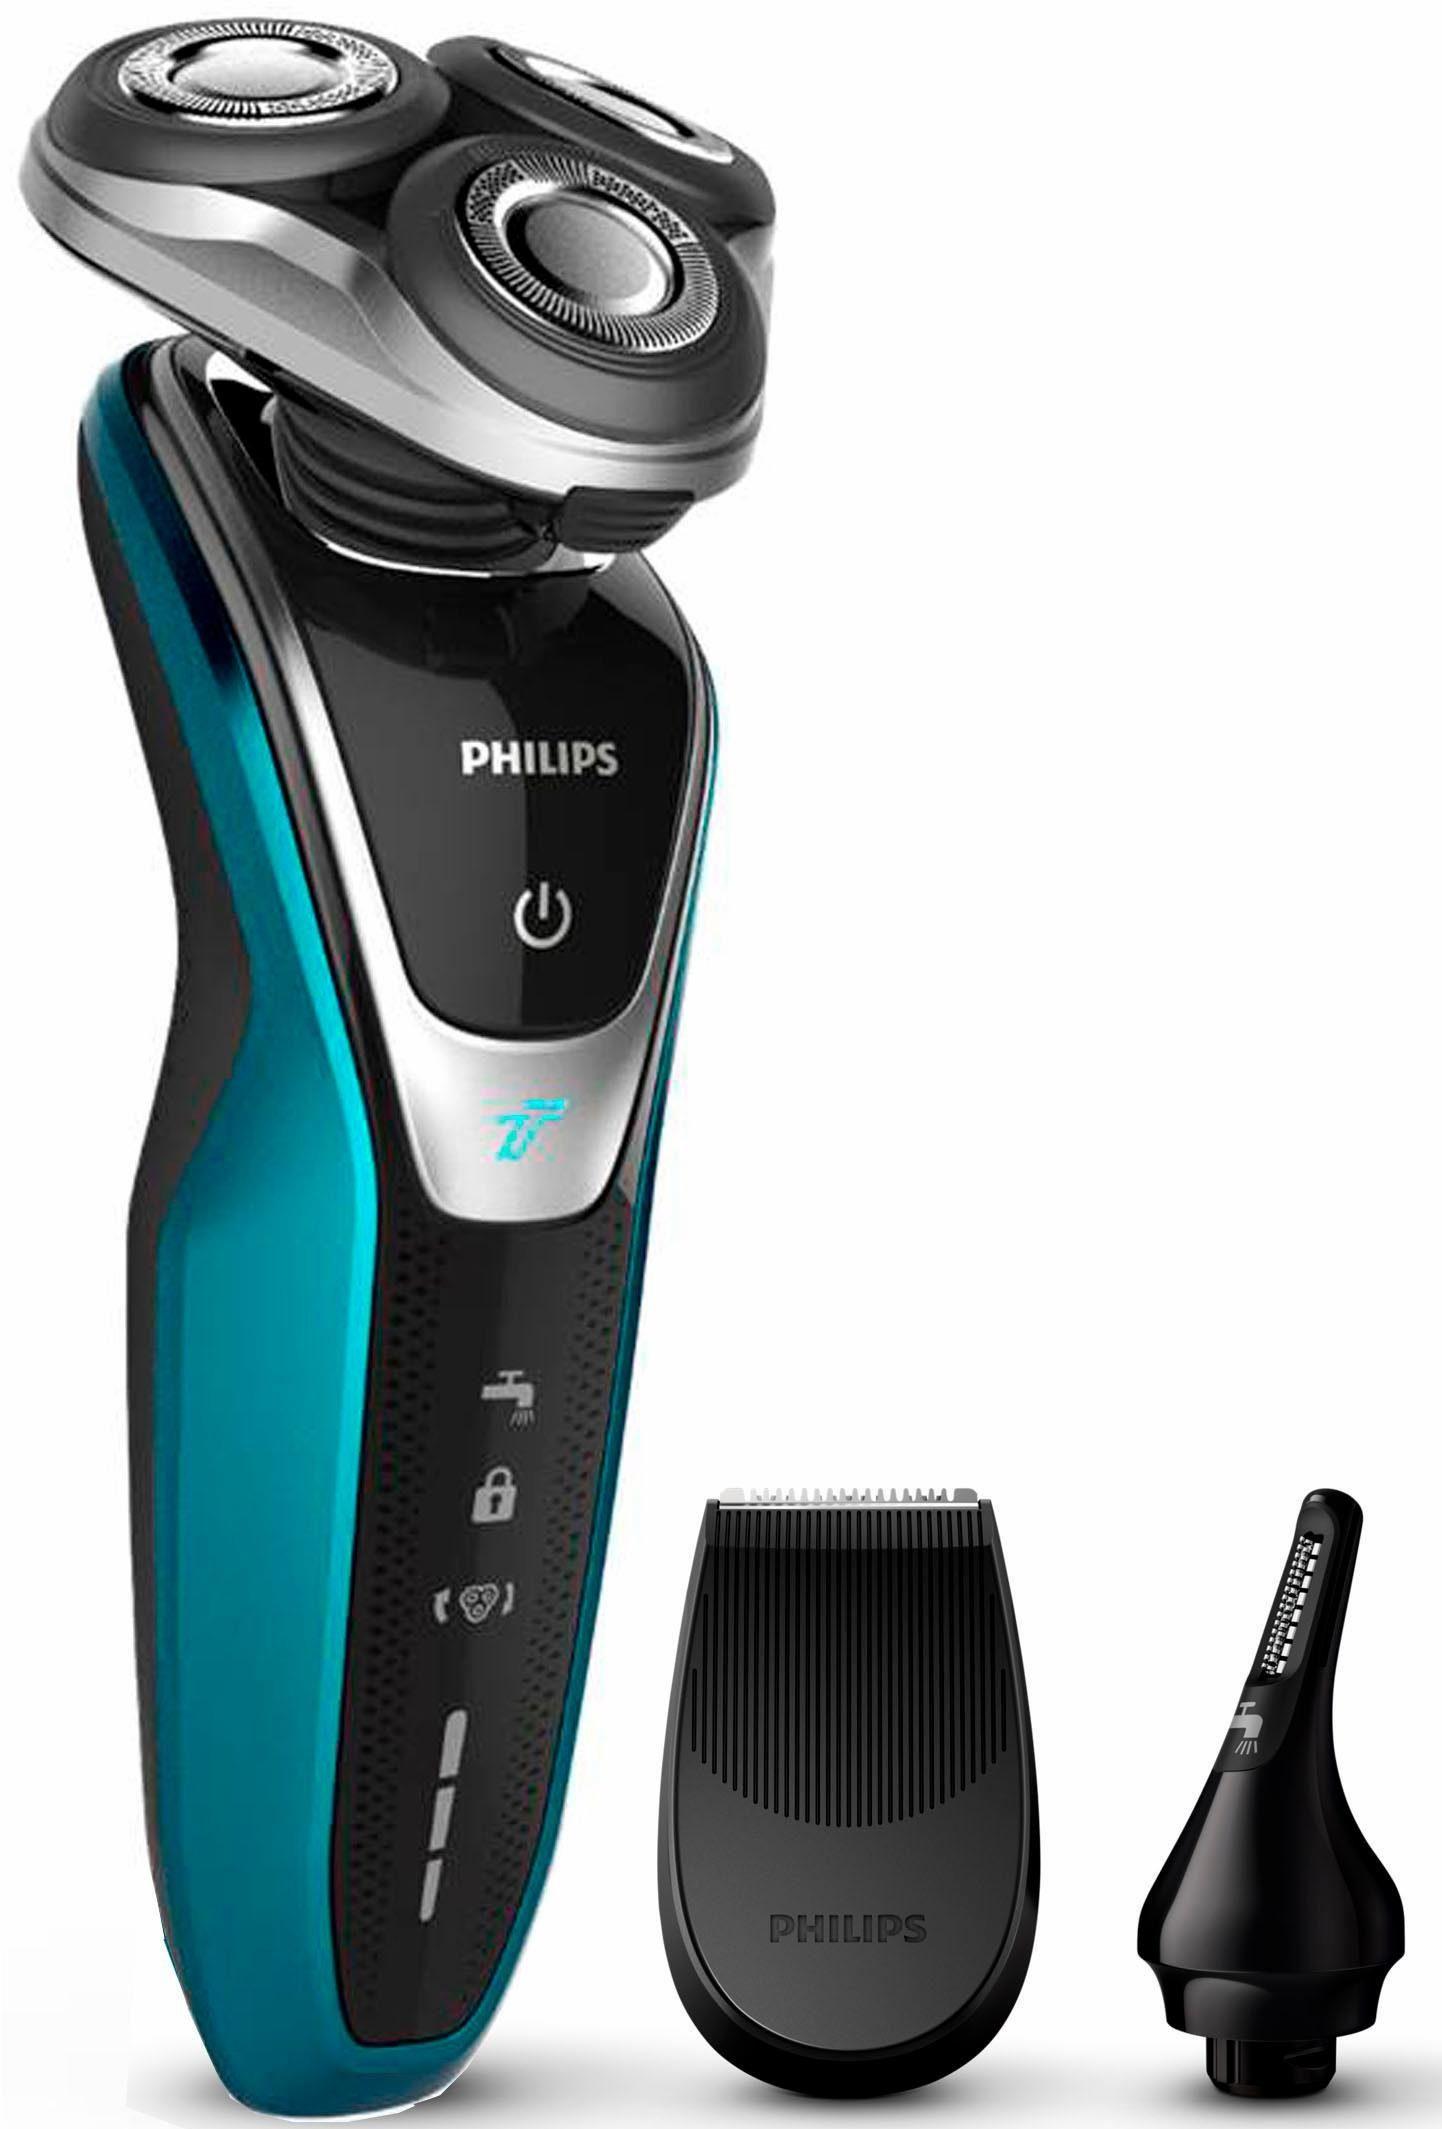 Philips Elektrorasierer Series 5000 S5550/44, Aufsätze: 2, Langhaartrimmer, mit Präzisions- u. Nasenhaartrimmer, AquaTouch Wet&Dry, Akku